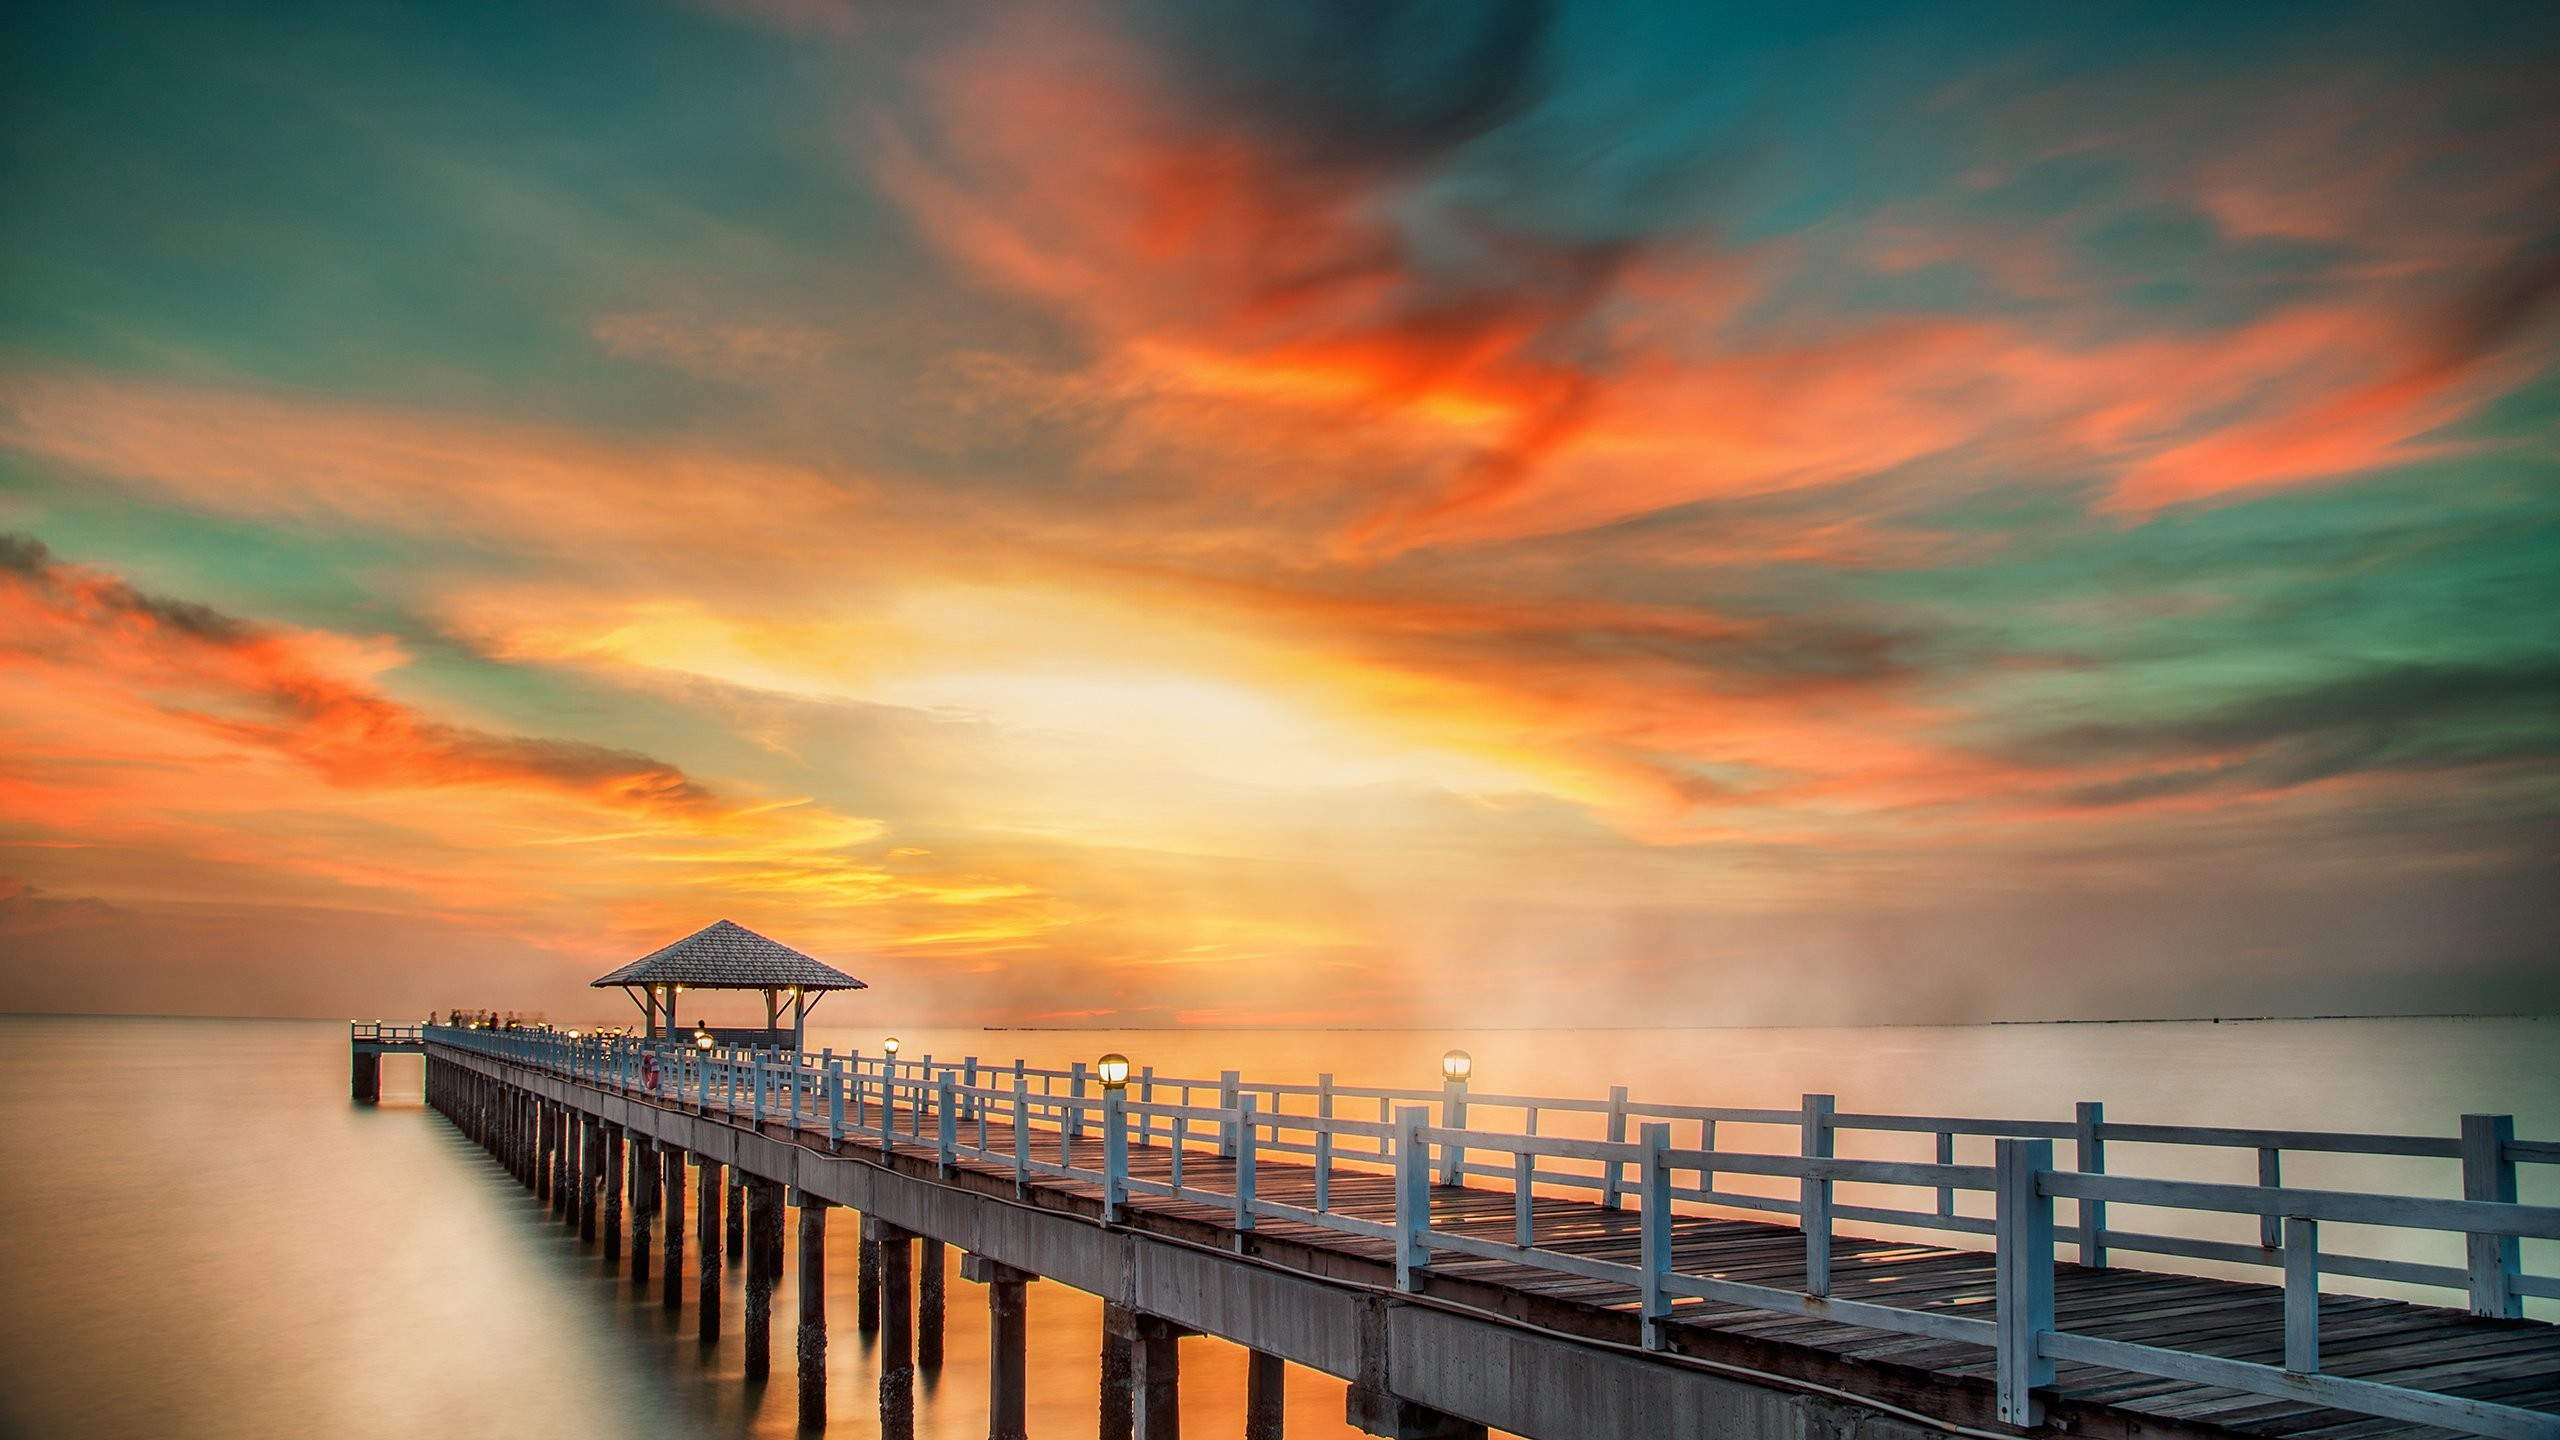 Res: 2560x1440, ocean sunset wallpaper #821973